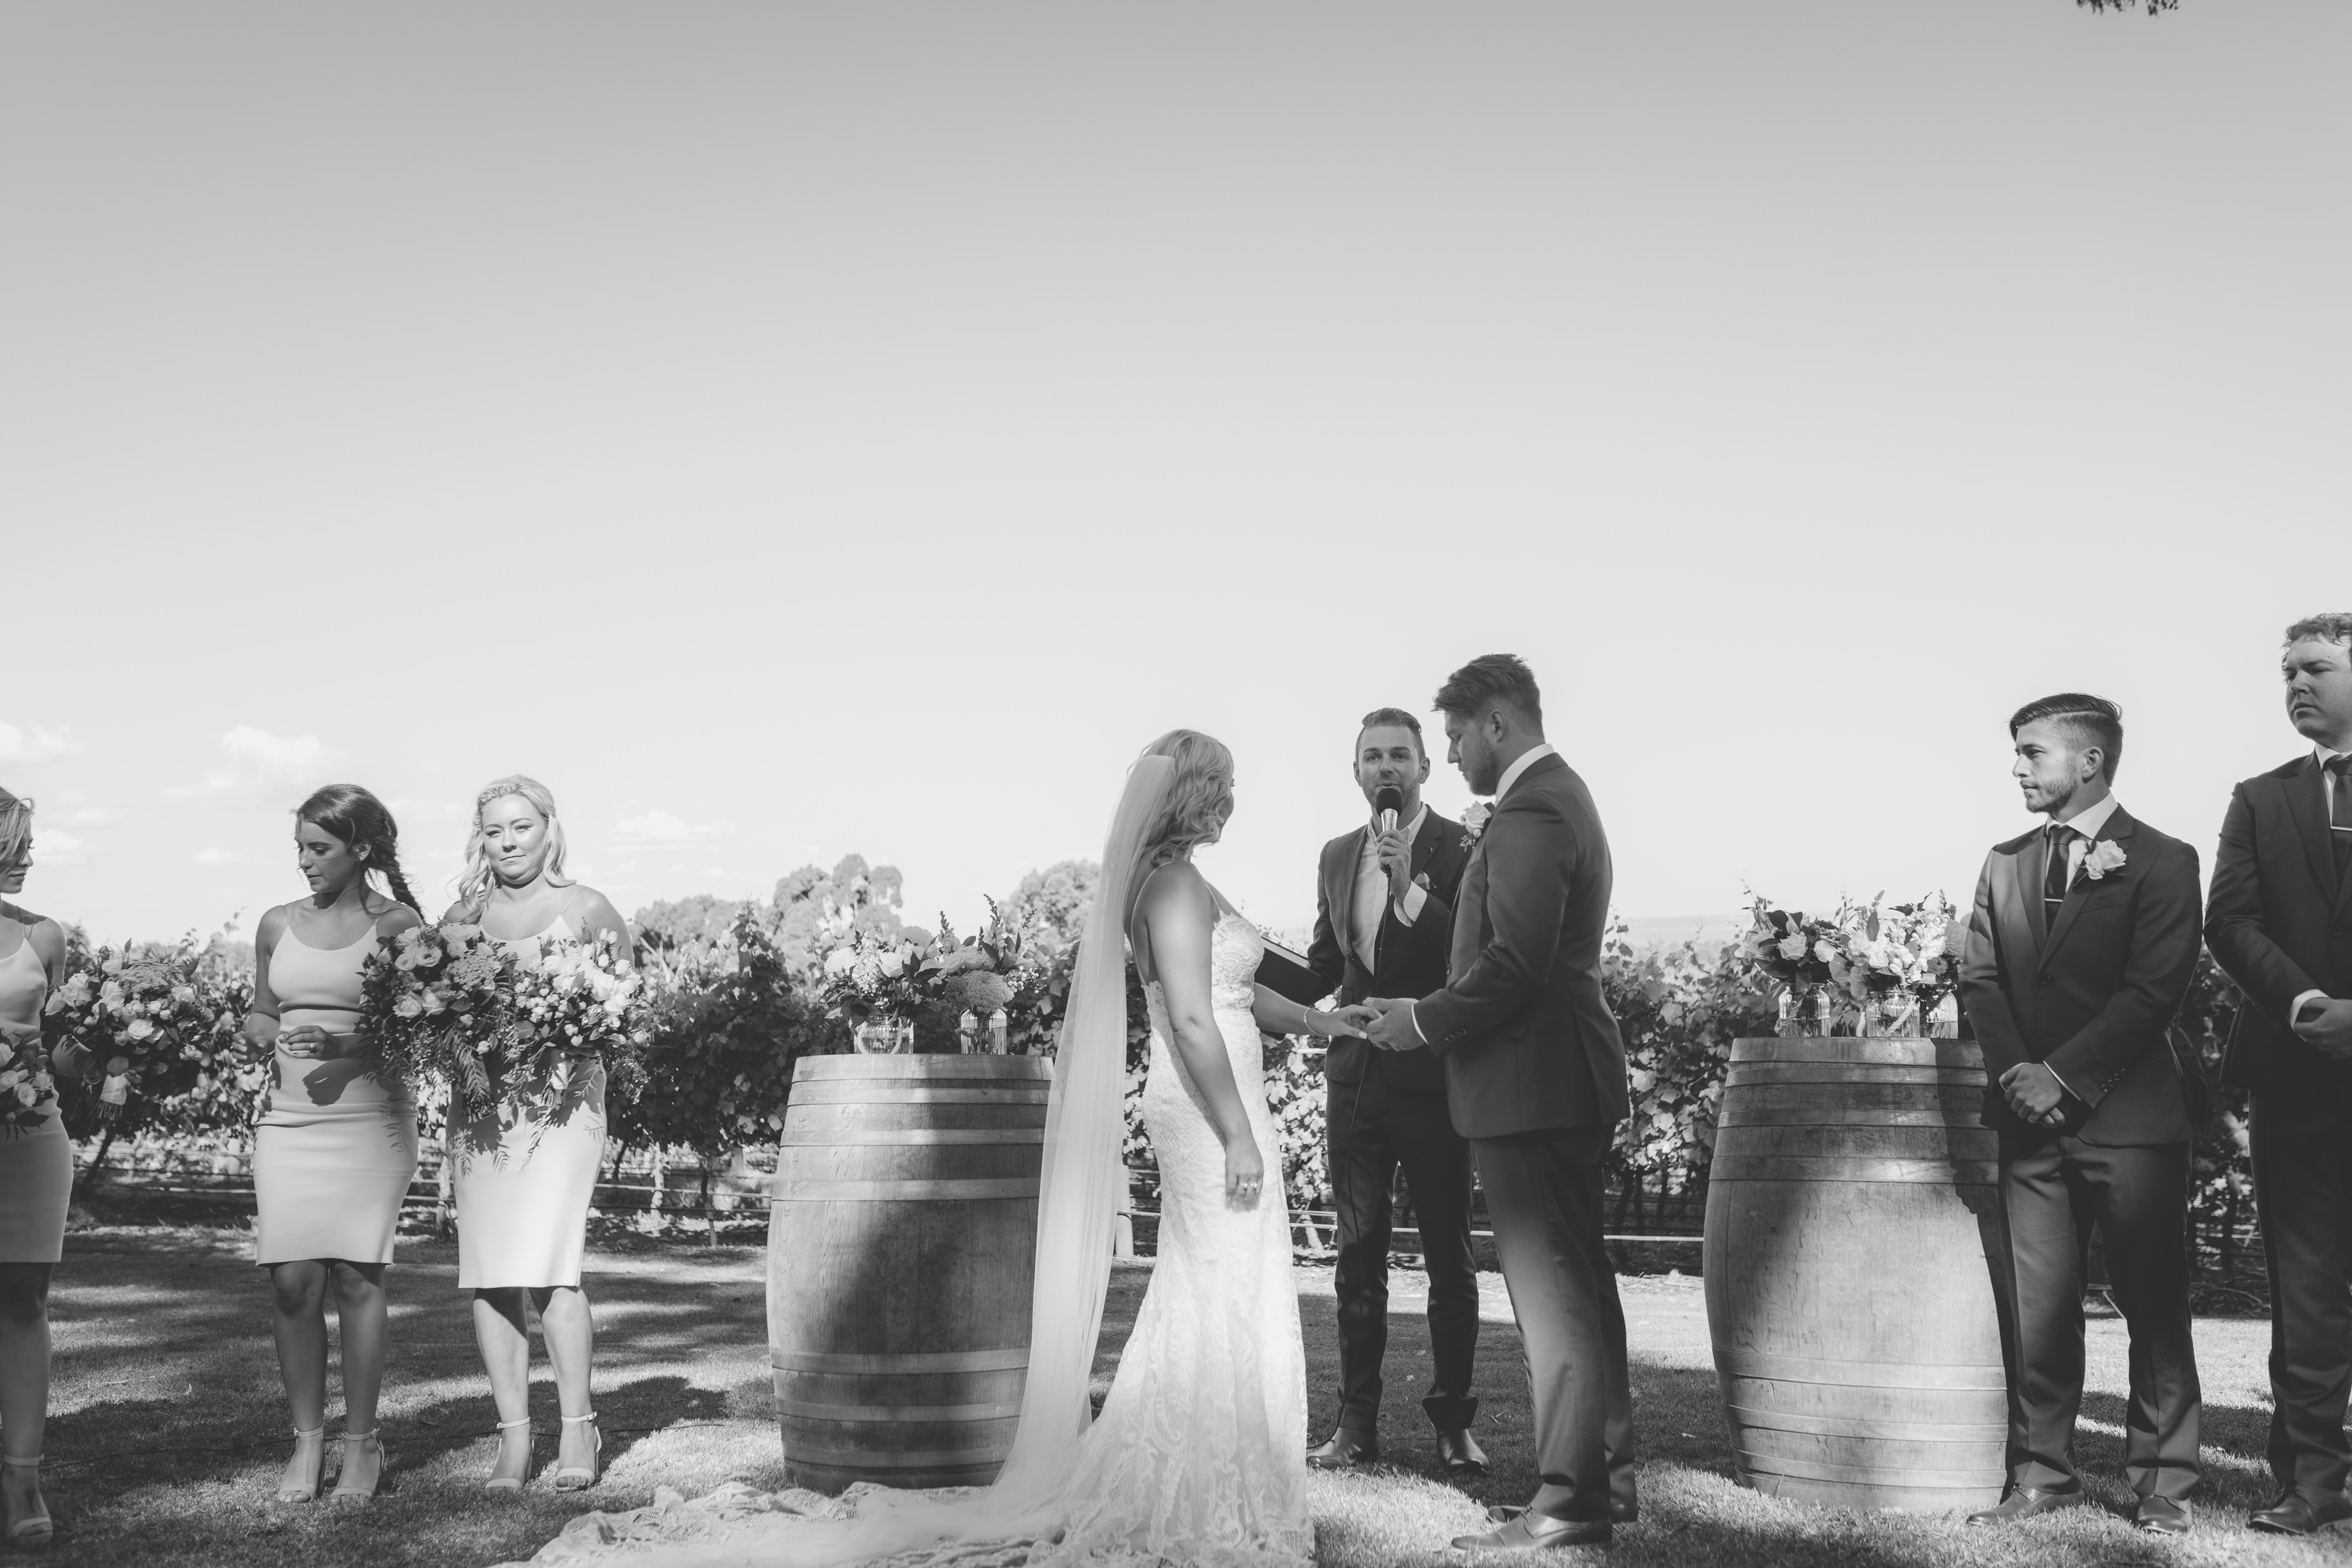 wedding celebrant fees